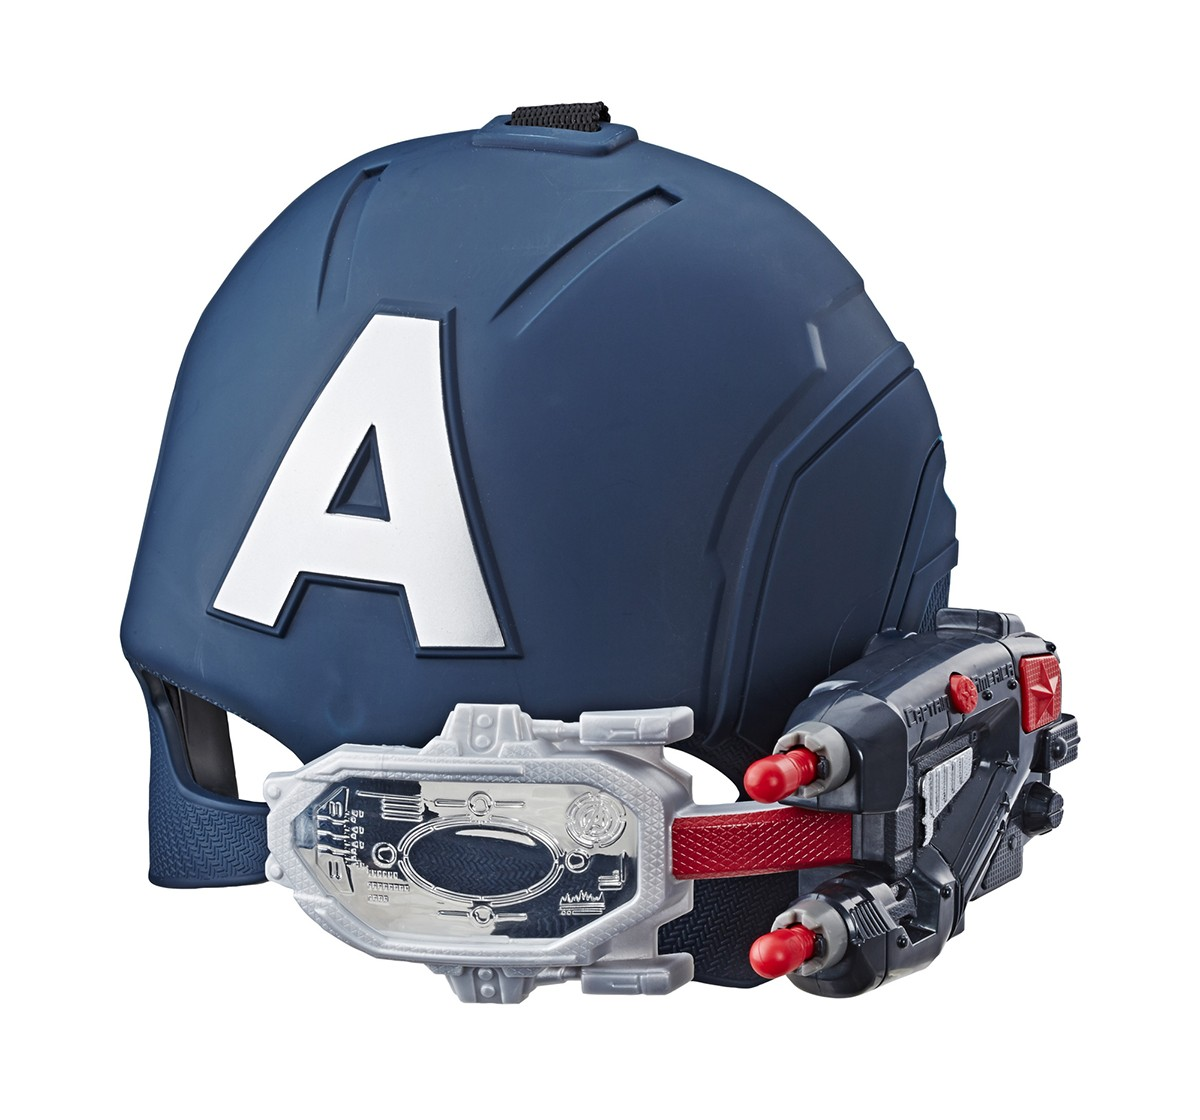 Marvel Avengers Captain America Scope Vision Helmet Action Figures for BOYS age 5Y+